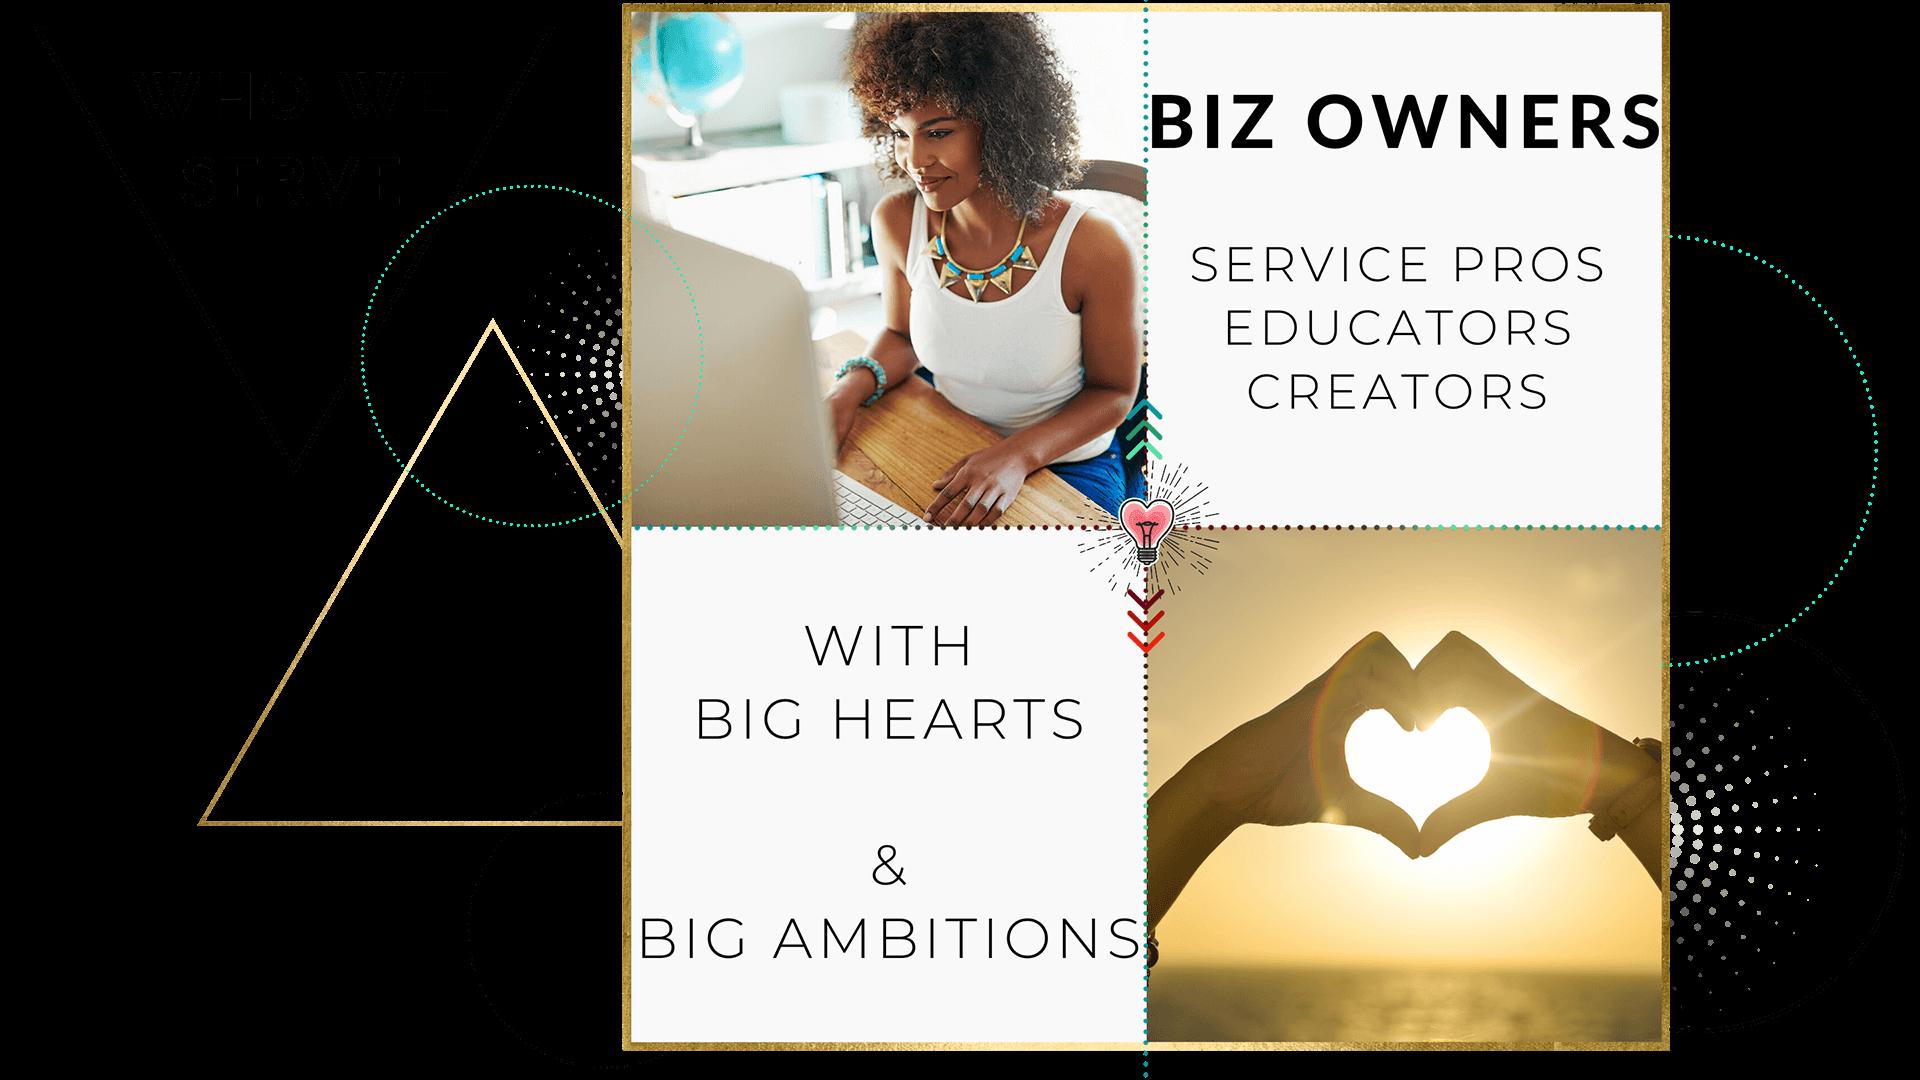 We Serve Biz Owners with Big Hearts + Goals